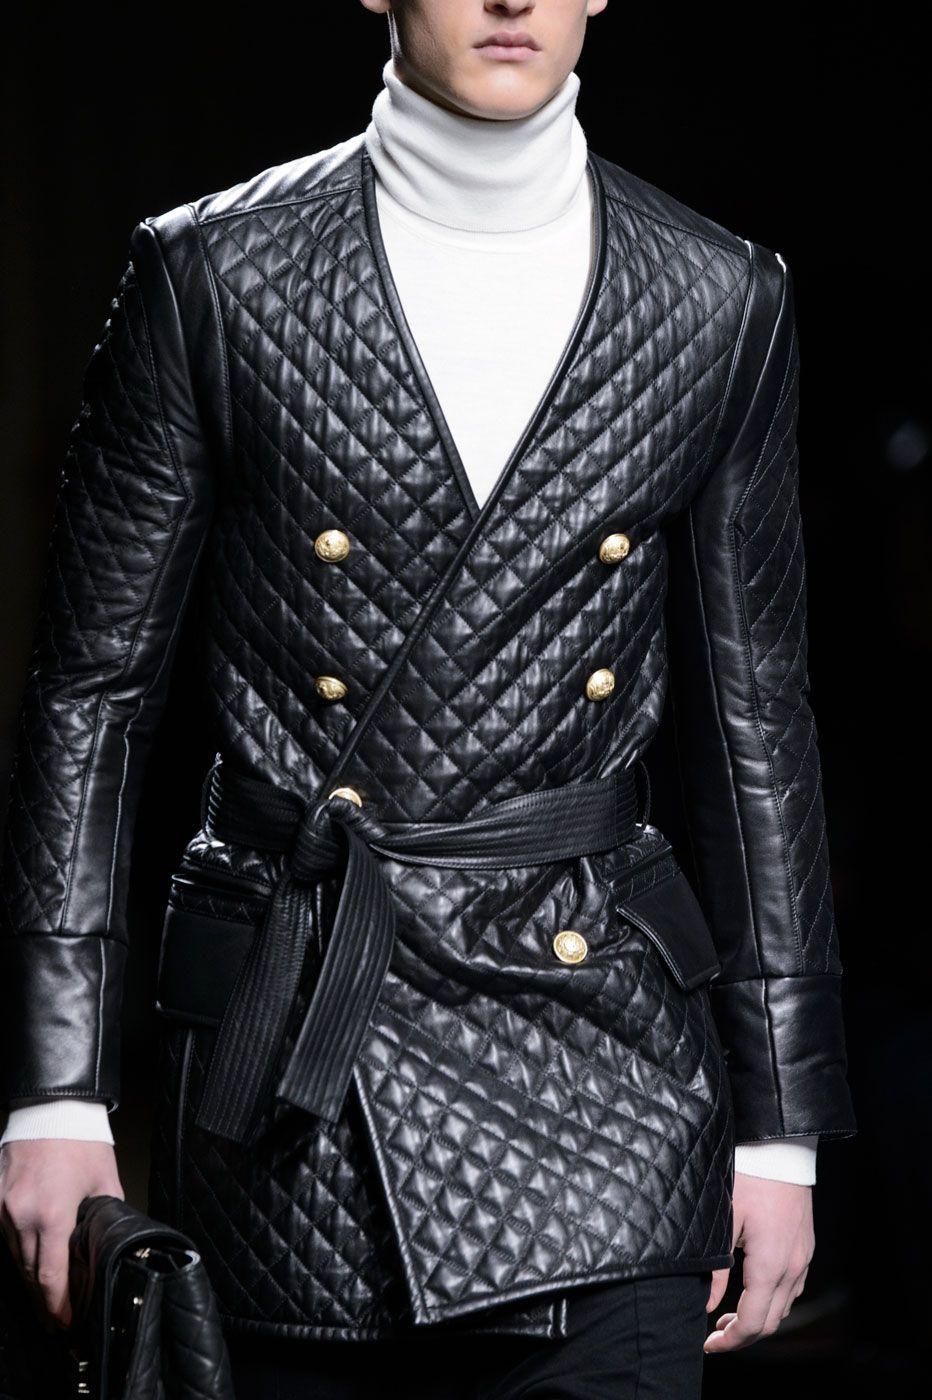 Balmain menswear FW16 | See more fashion at styleisviral.com